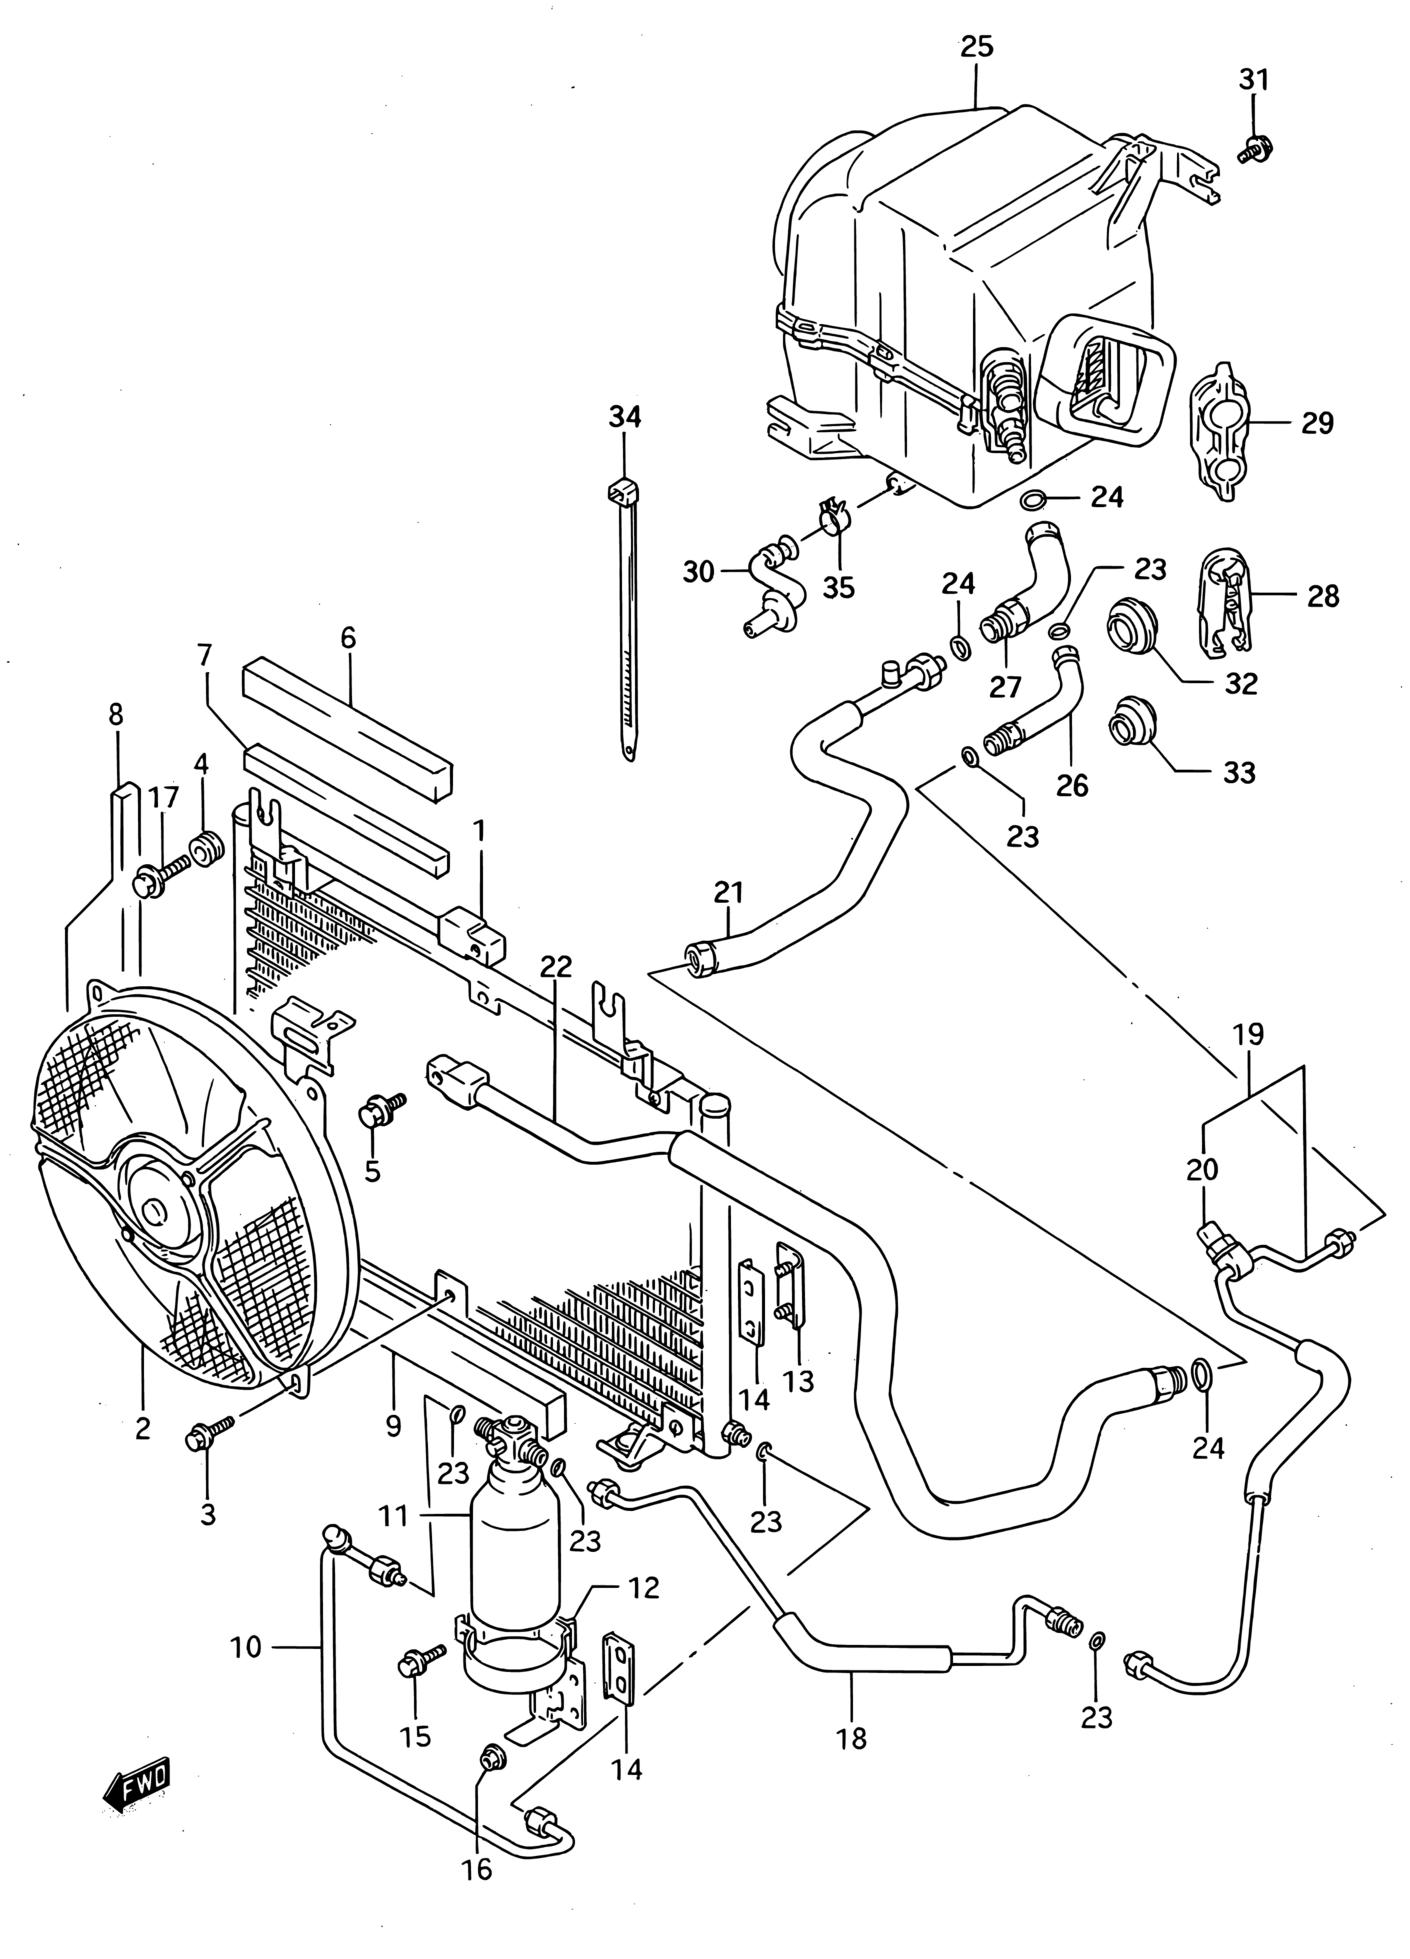 Latin America, Swift, SF416-2 (E01), Air Conditioning, 184